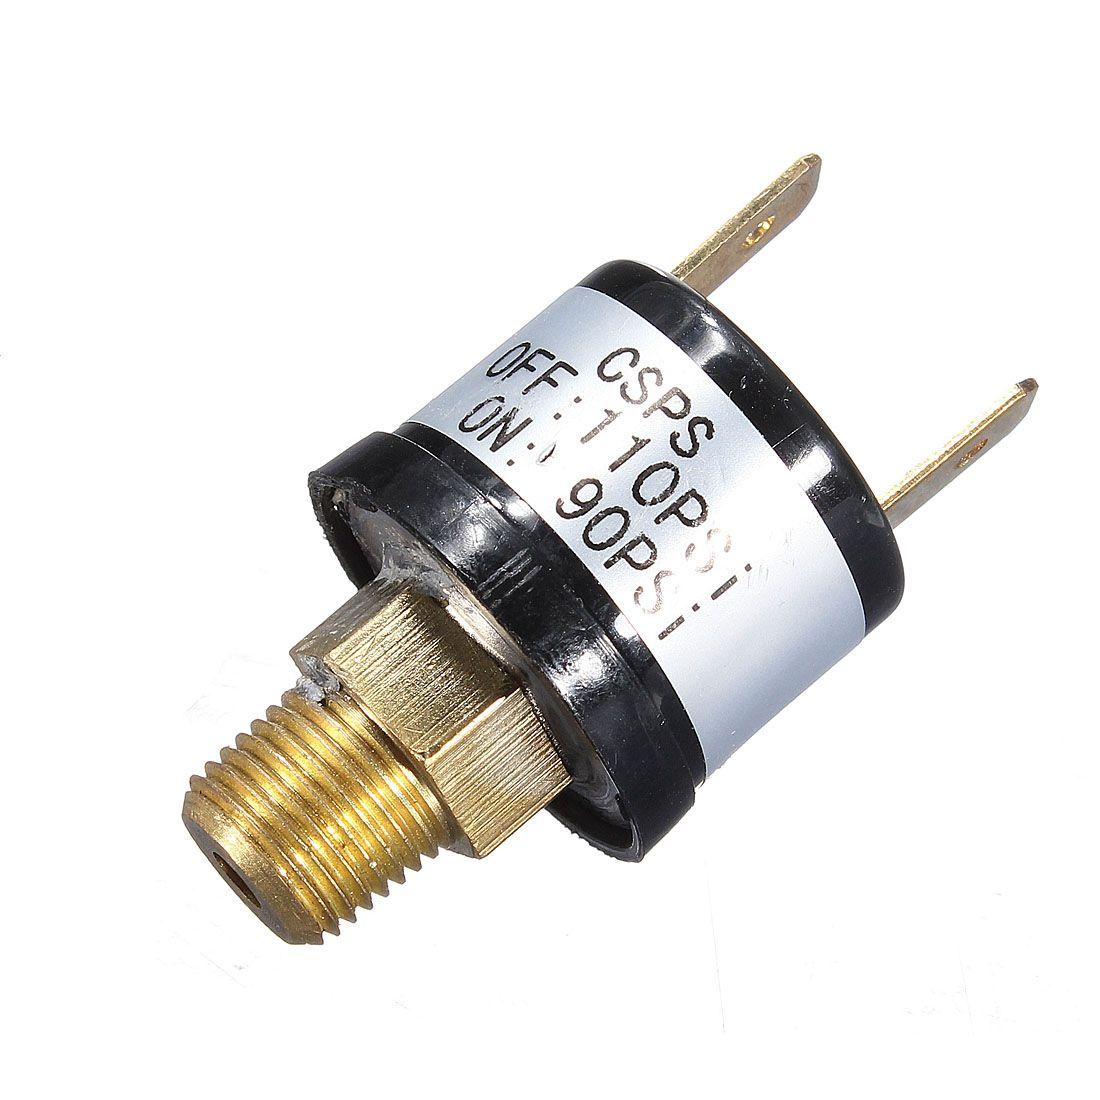 $4.32 (Buy here: https://alitems.com/g/1e8d114494ebda23ff8b16525dc3e8/?i=5&ulp=https%3A%2F%2Fwww.aliexpress.com%2Fitem%2F90-110-PSI-Train-Horn-Trumpet-Air-Compressor-Pressure-Control-Switch-Heavy-Duty%2F32707497684.html ) 90-110 PSI Train Horn Trumpet Air Compressor Pressure Control Switch Heavy Duty for just $4.32